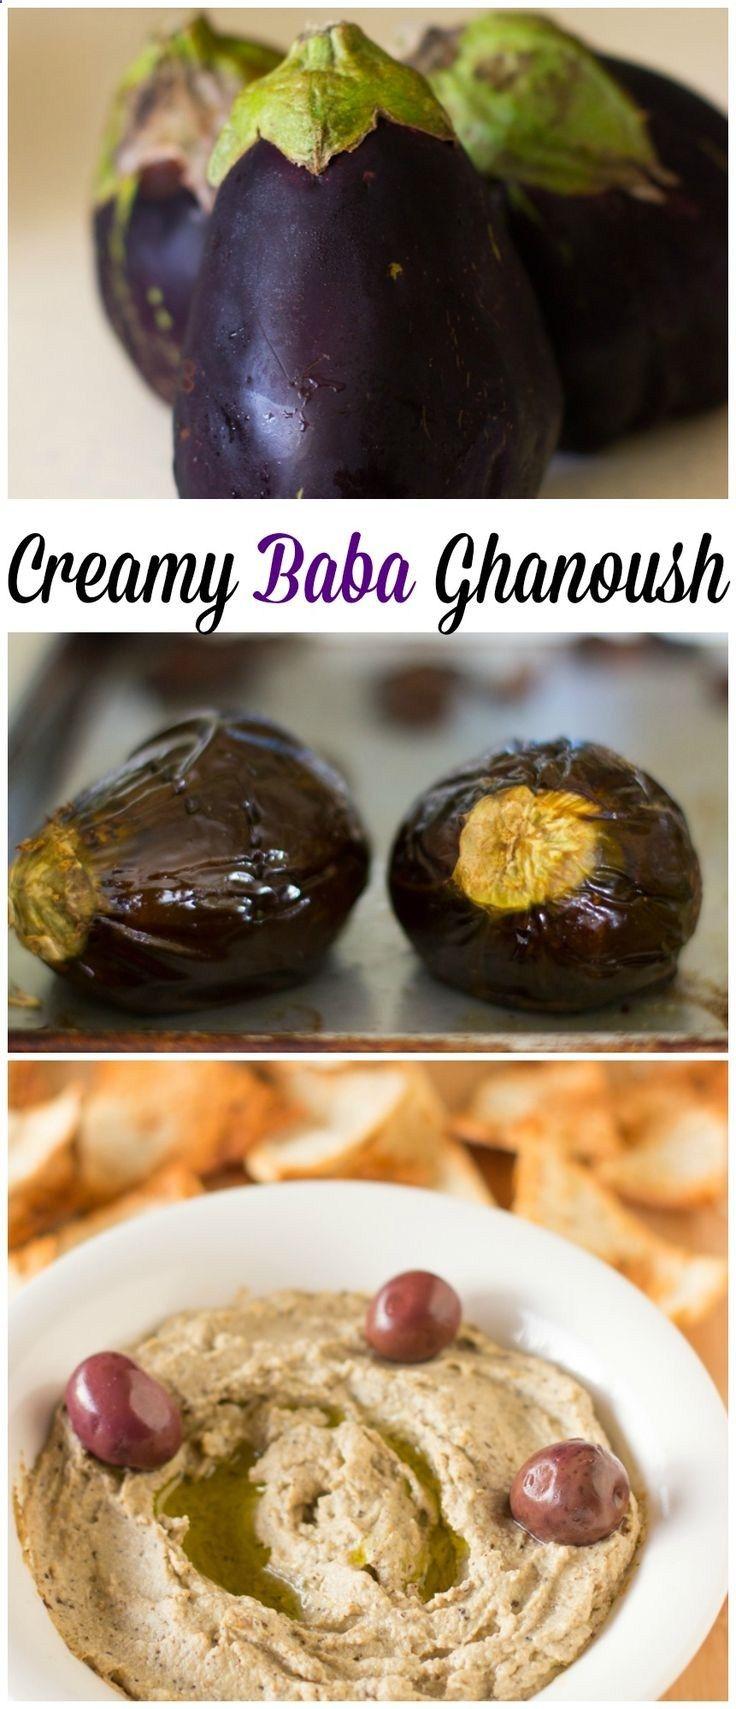 Baba Ghanoush is a creamy, classic Mediterranean eggplant dip that ...